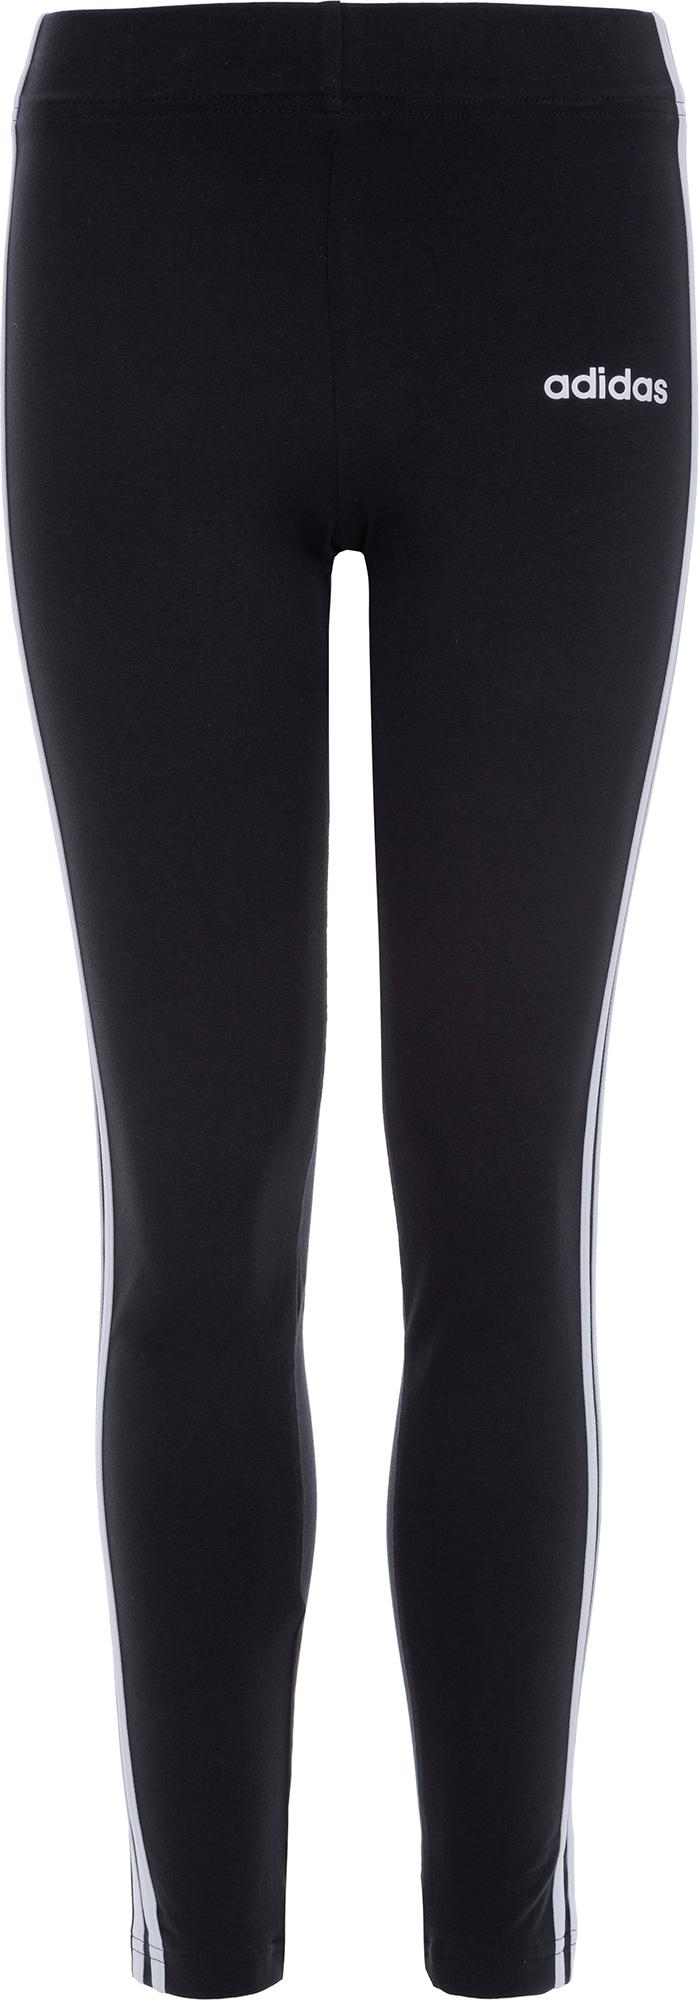 Adidas Легинсы для девочек Essentials 3-Stripes, размер 140